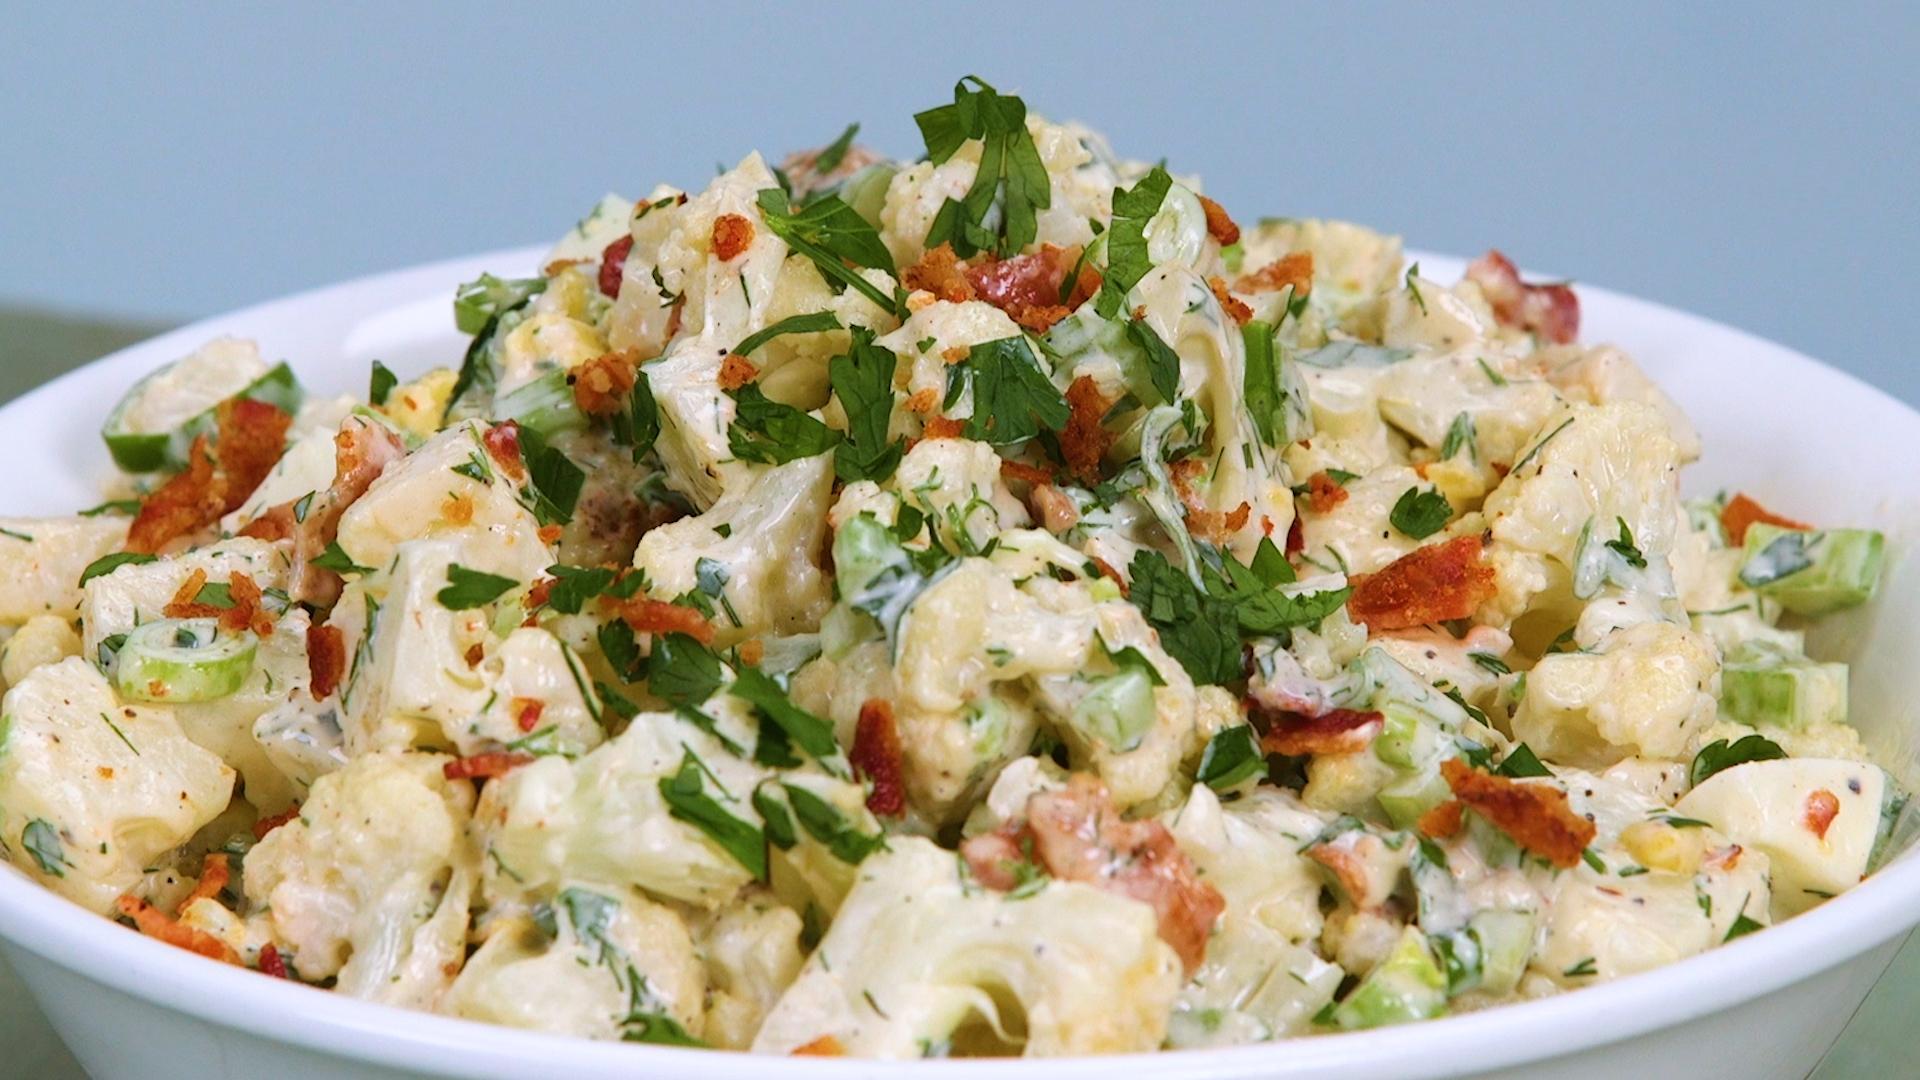 Cauli-Tater Salad